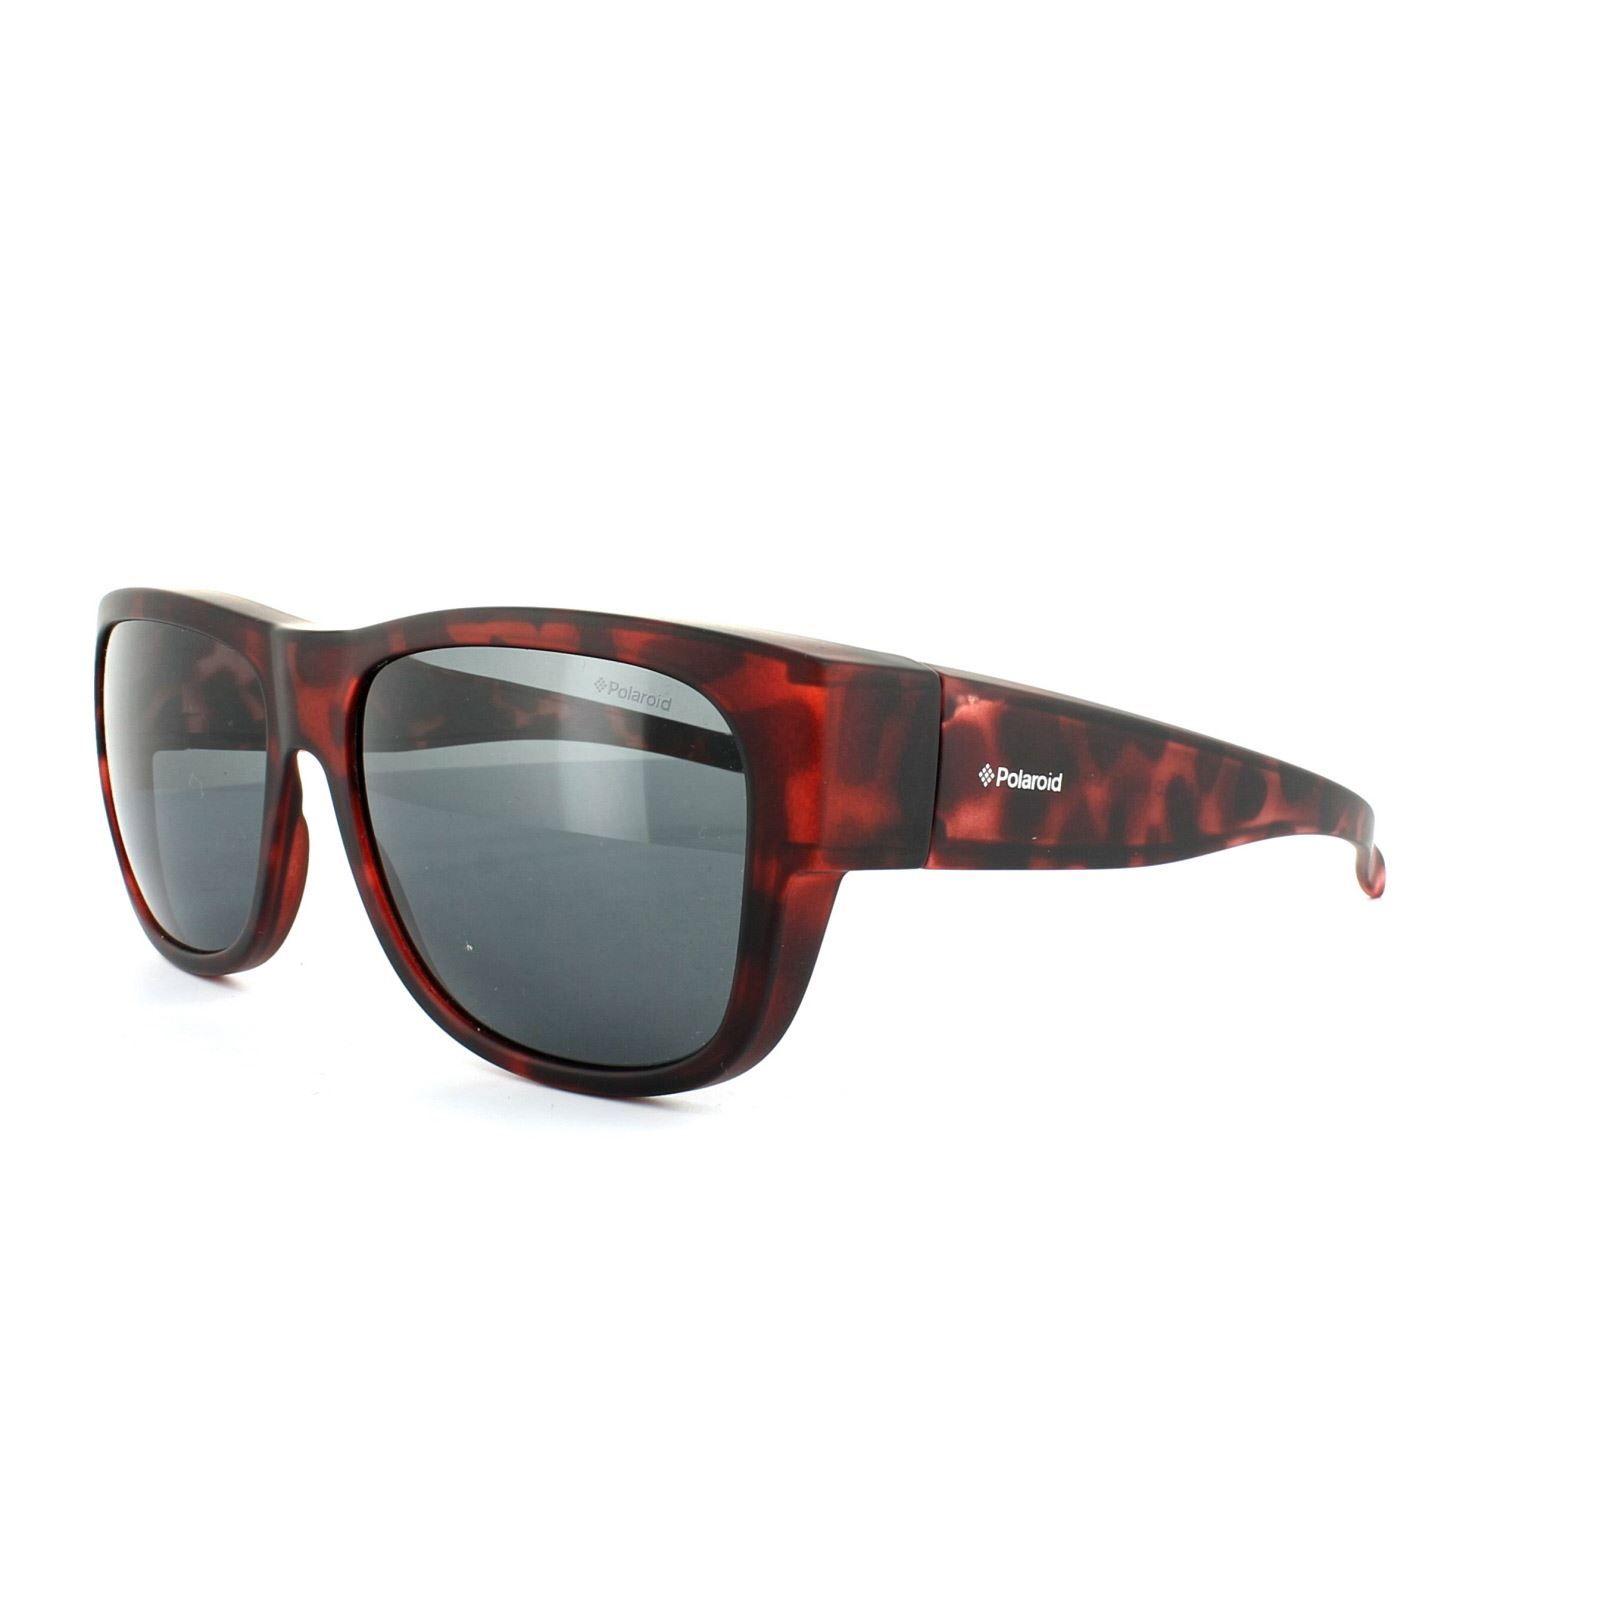 Polaroid Suncovers Fitover Sunglasses 9003/S MRJ Y2 Havana Grey Polarized